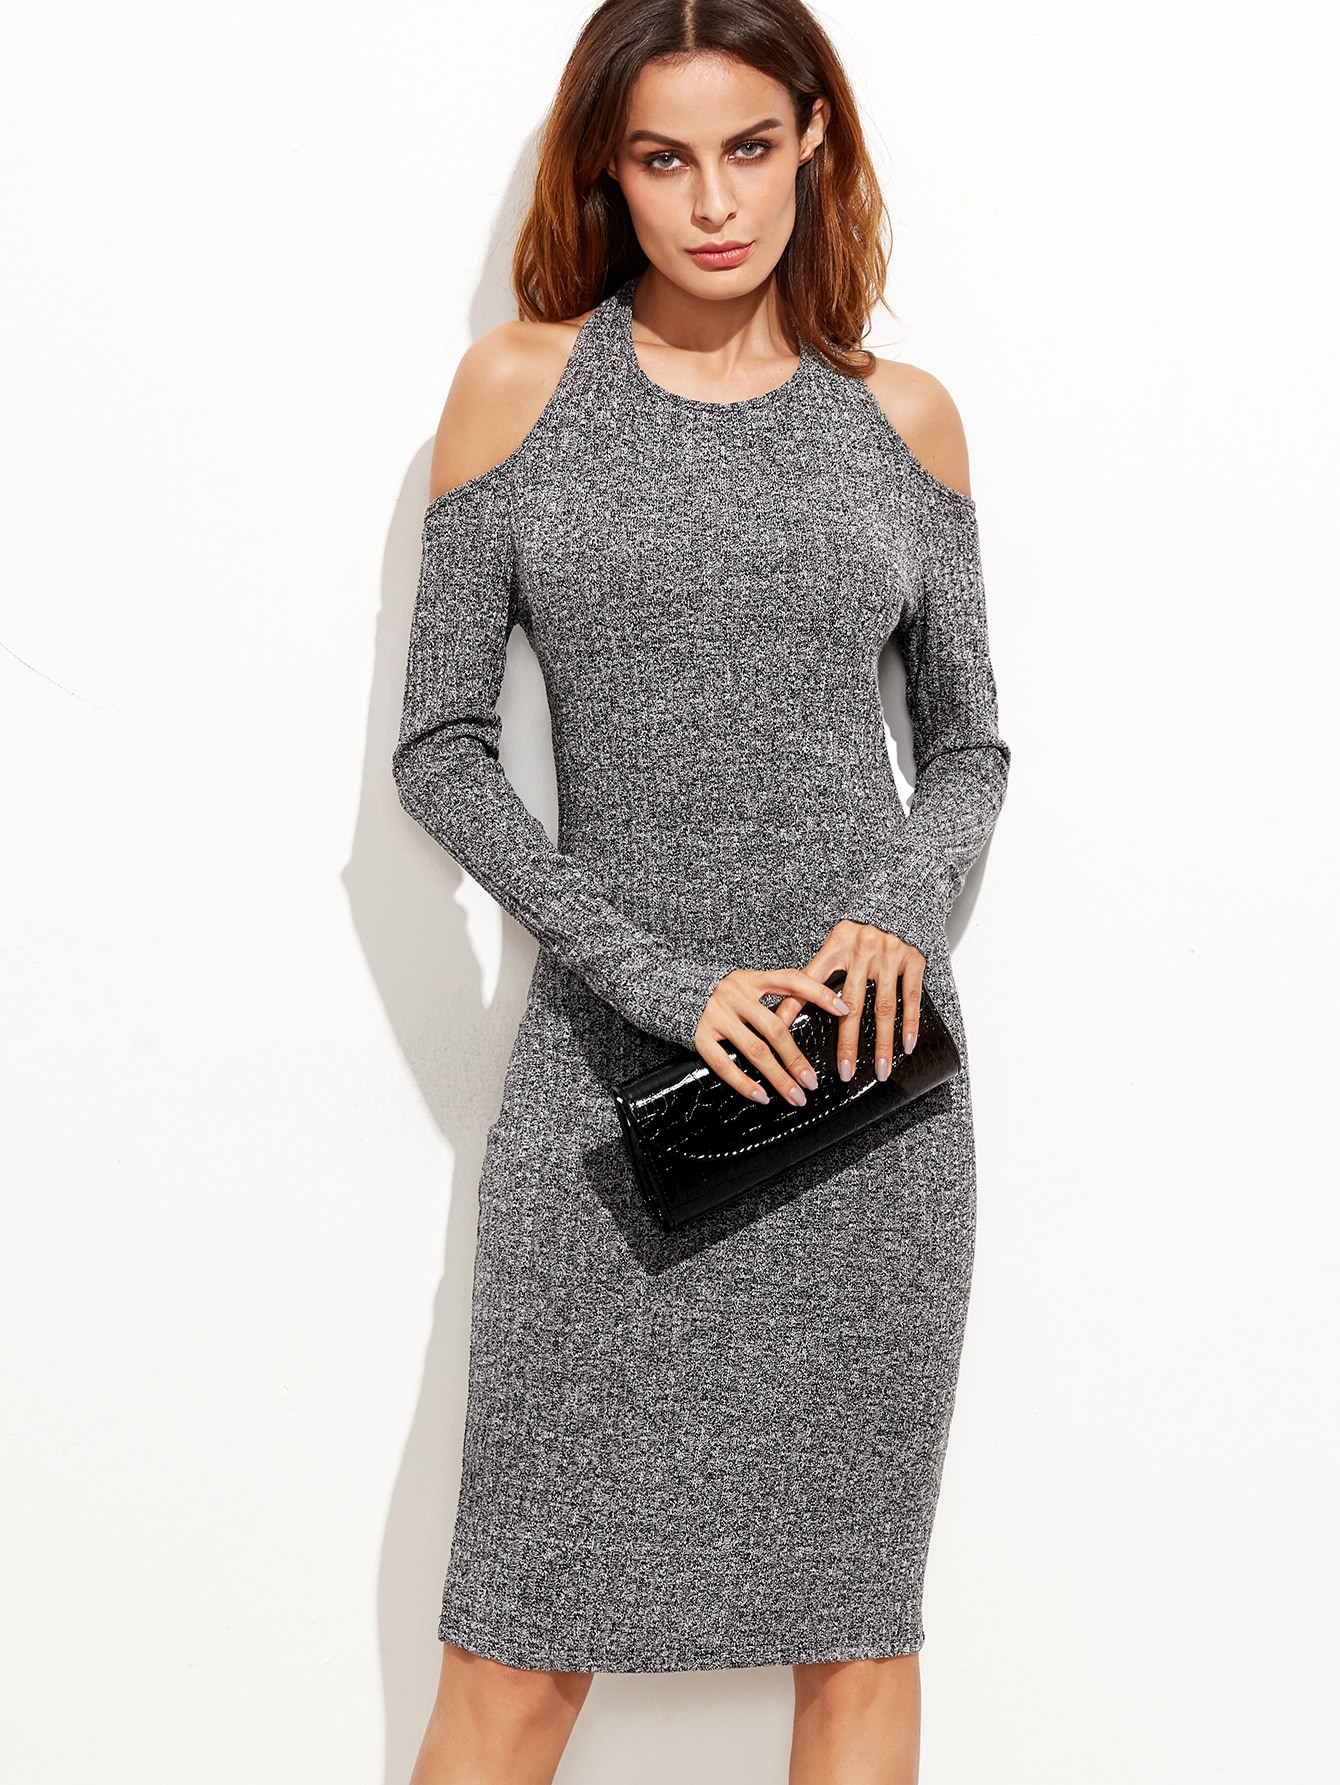 Grey Marled Knit Cold Shoulder Cutout Tie Back Pencil Dress